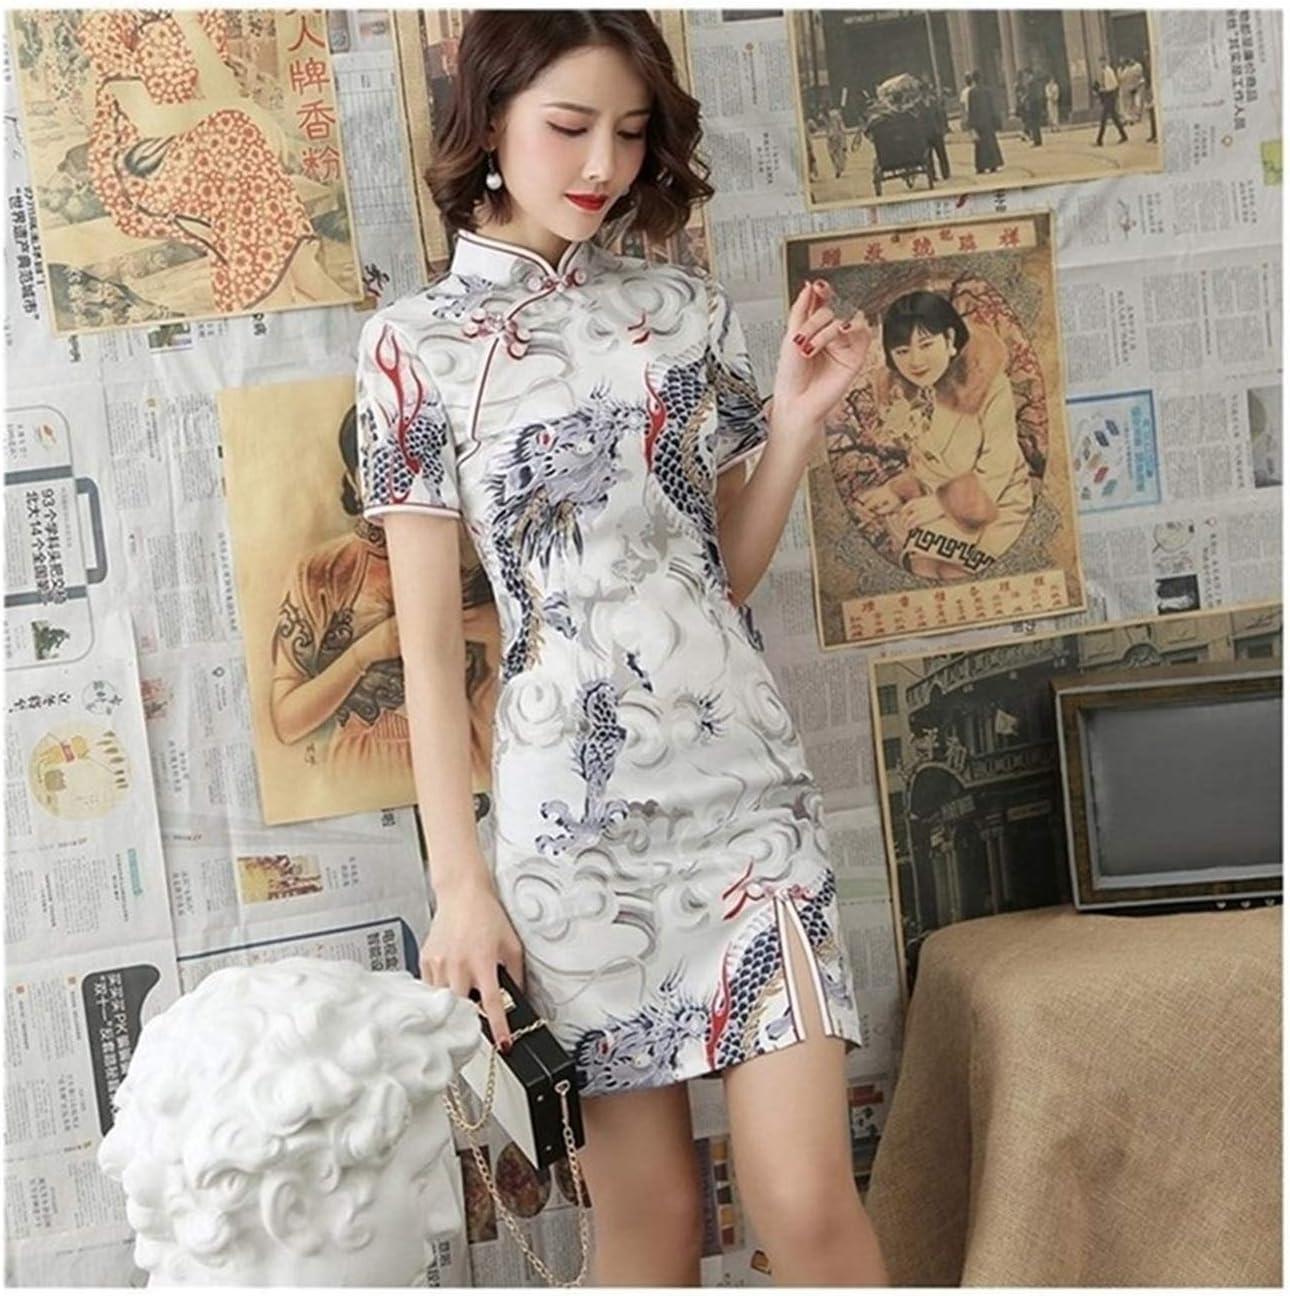 XIAOXINGXING Chinese Cheap super special price Dress for Women Qipao Fees free!! Elegant Crane Dragon